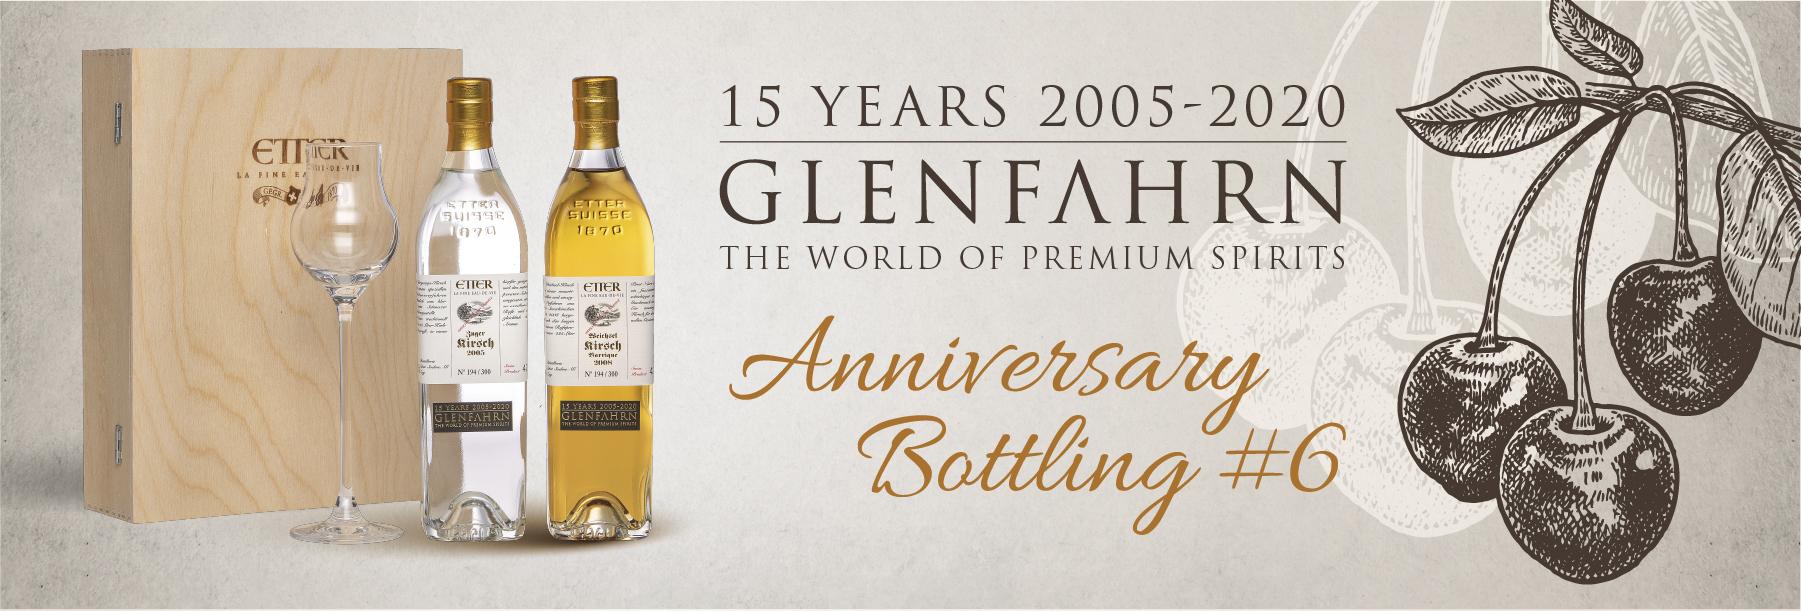 Glen Fahrn 15th Anniversary Bottling #6 Etter Set Jahrgangs-Edelkirsch